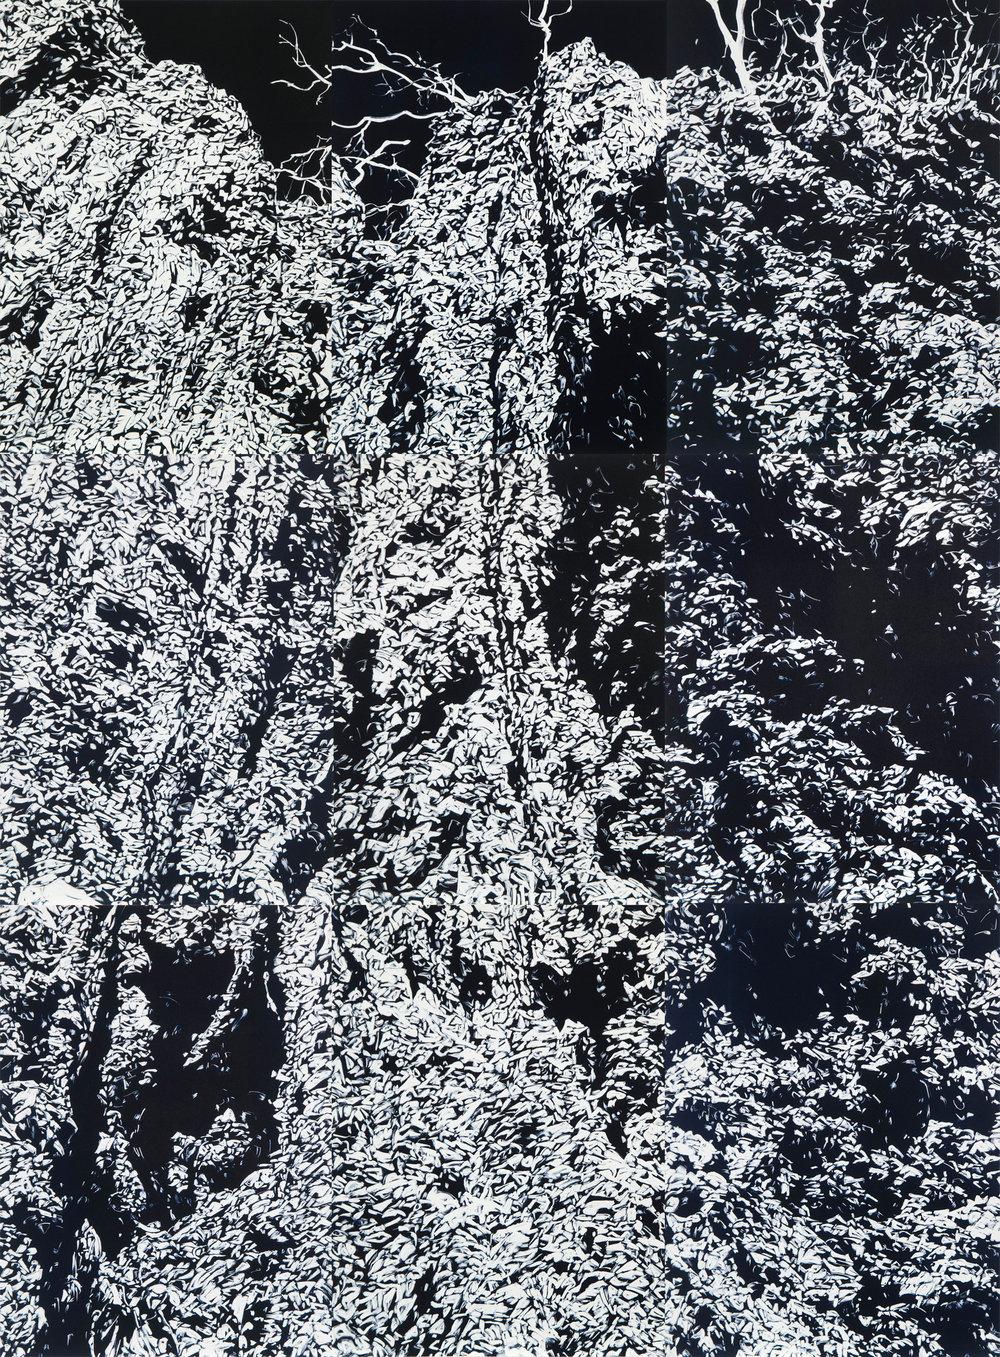 Annika Romeyn 'Chasm 1' monotype 228 x 168cm, 2017